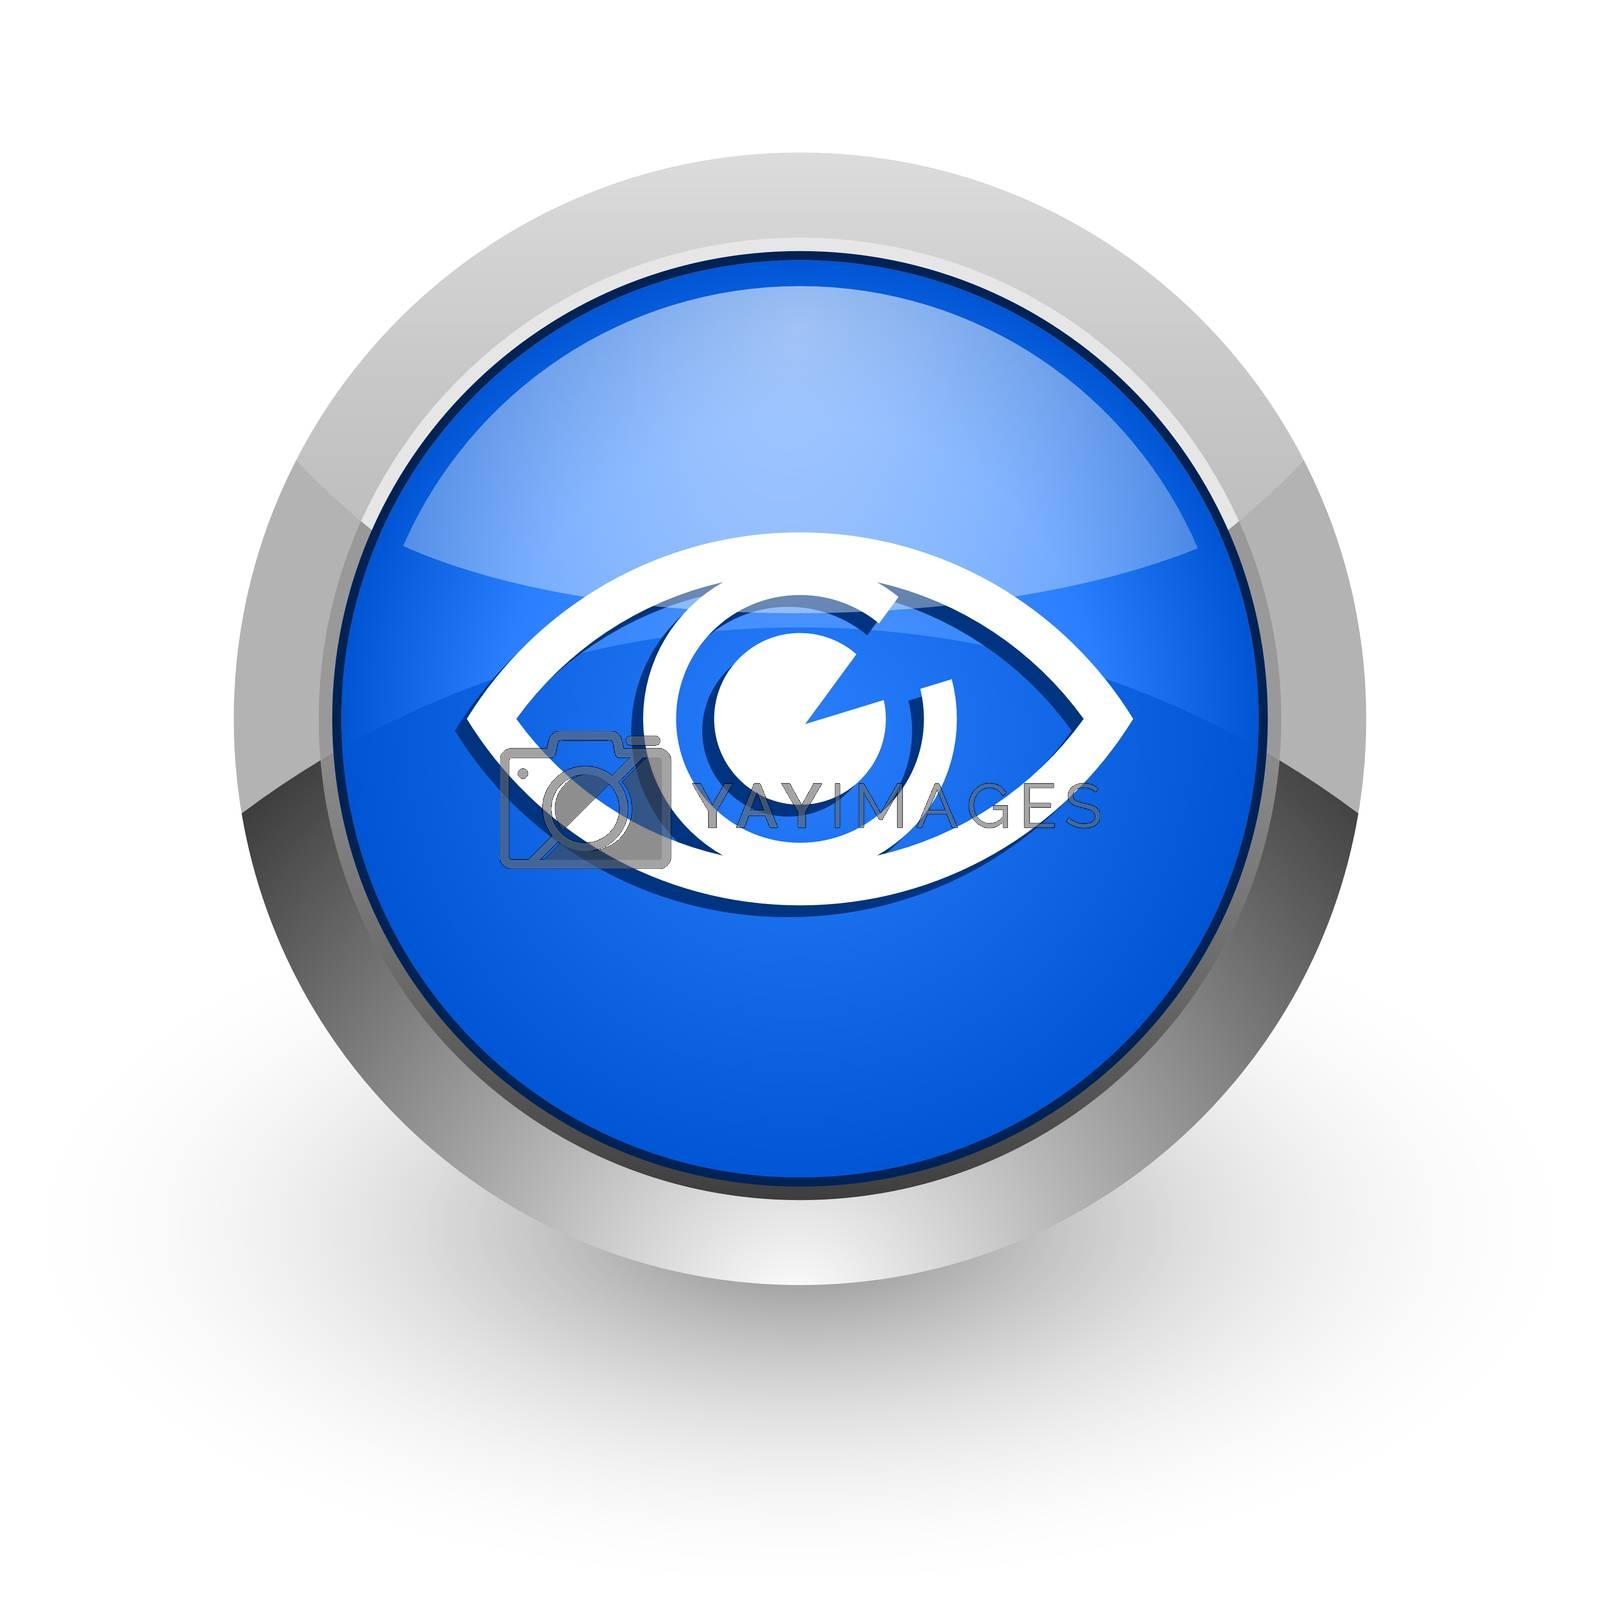 Royalty free image of eye blue glossy web icon by alexwhite